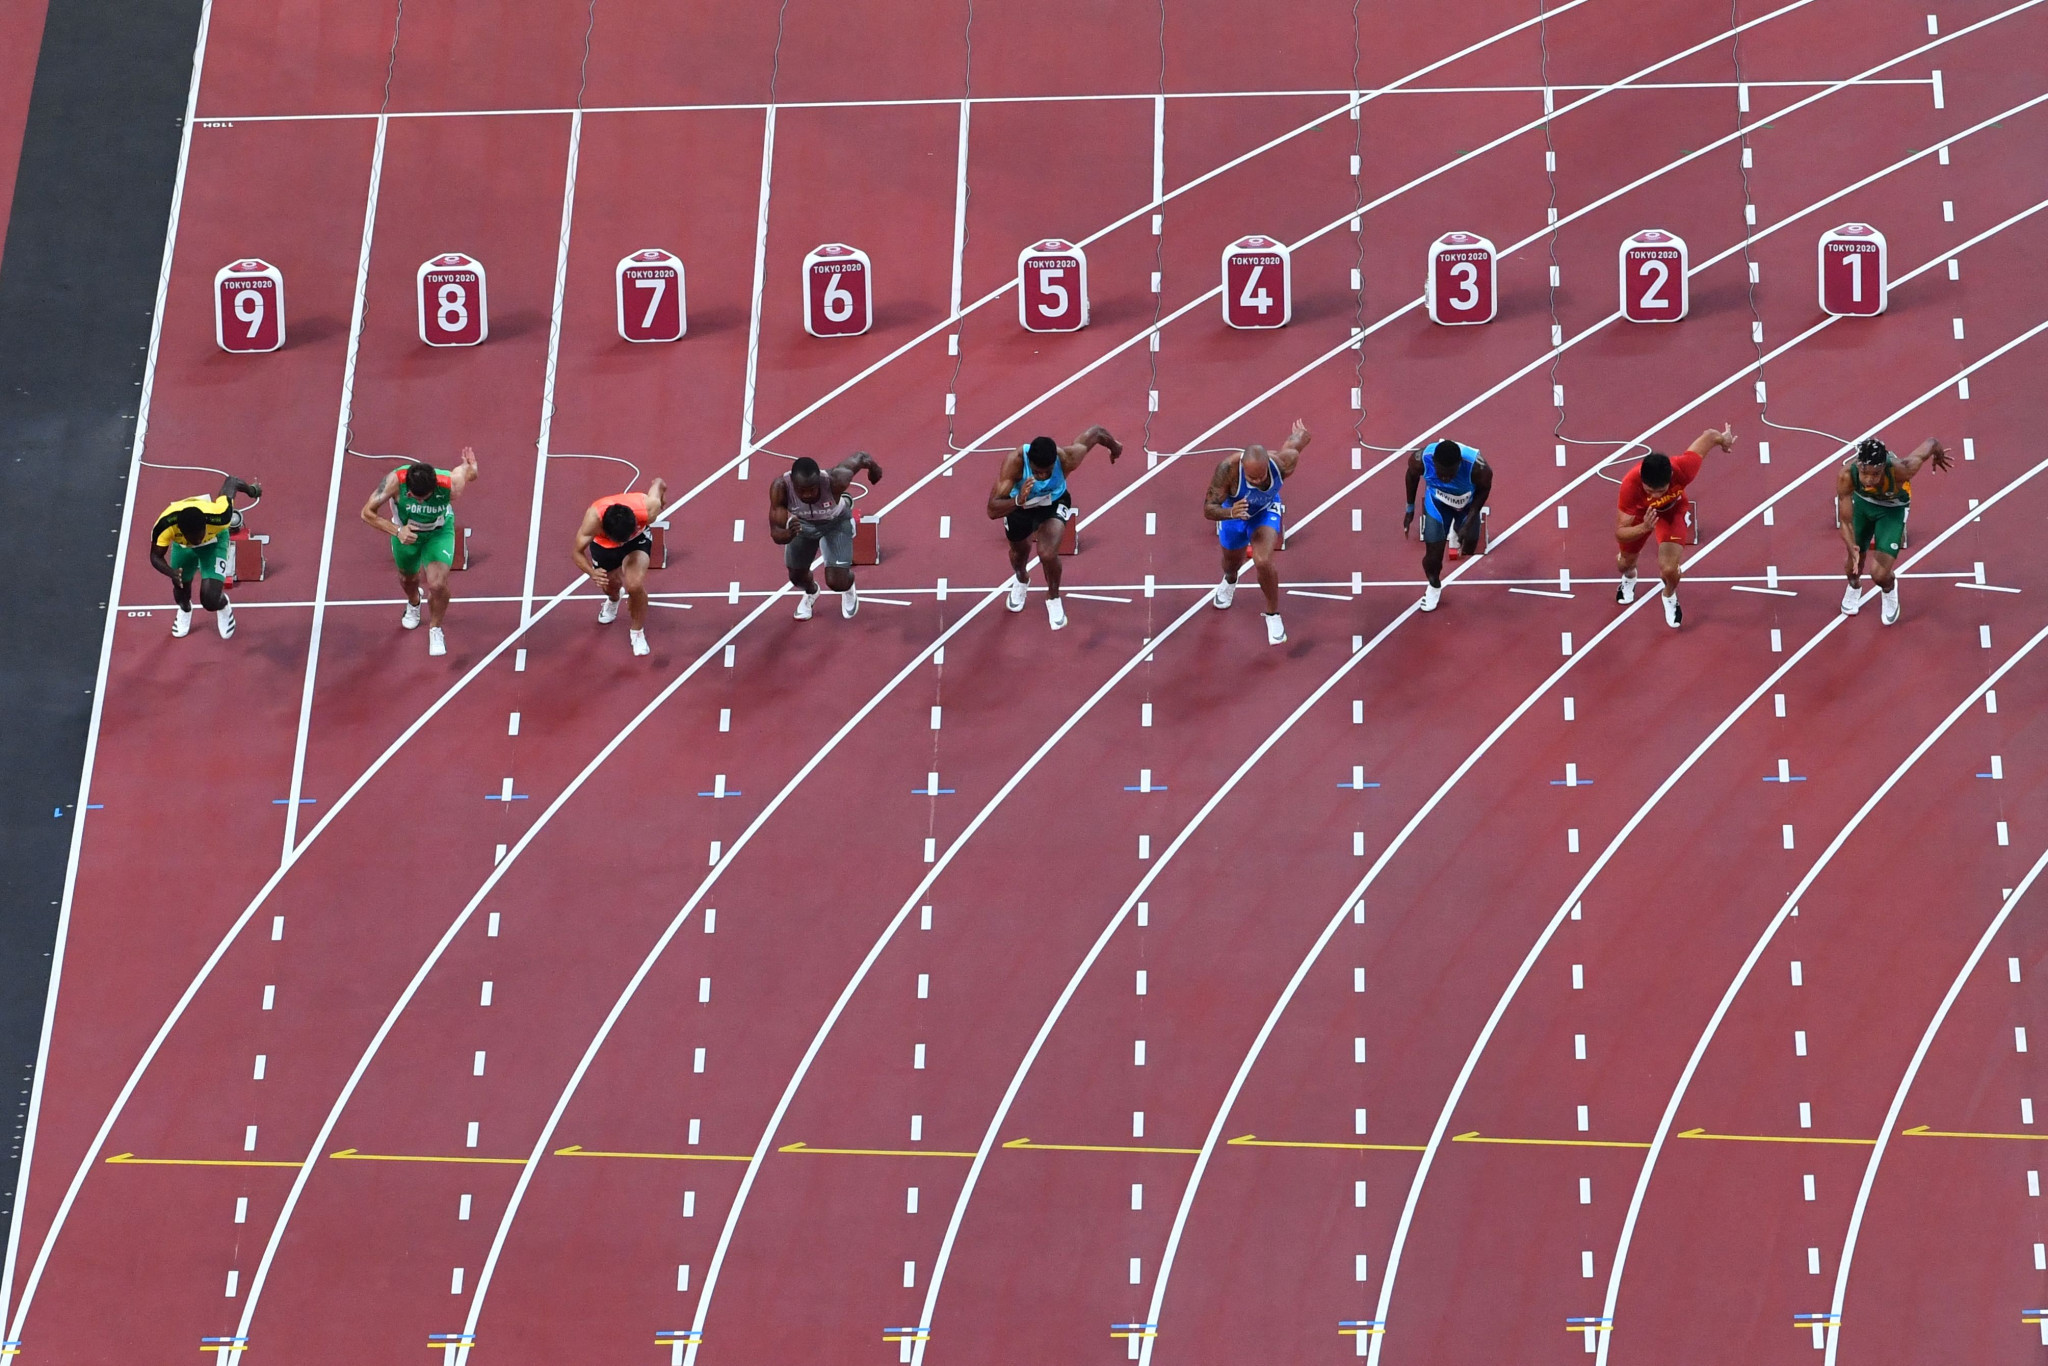 Sri Lanka Athletics set to implement tough qualifying standards for Hangzhou 2022